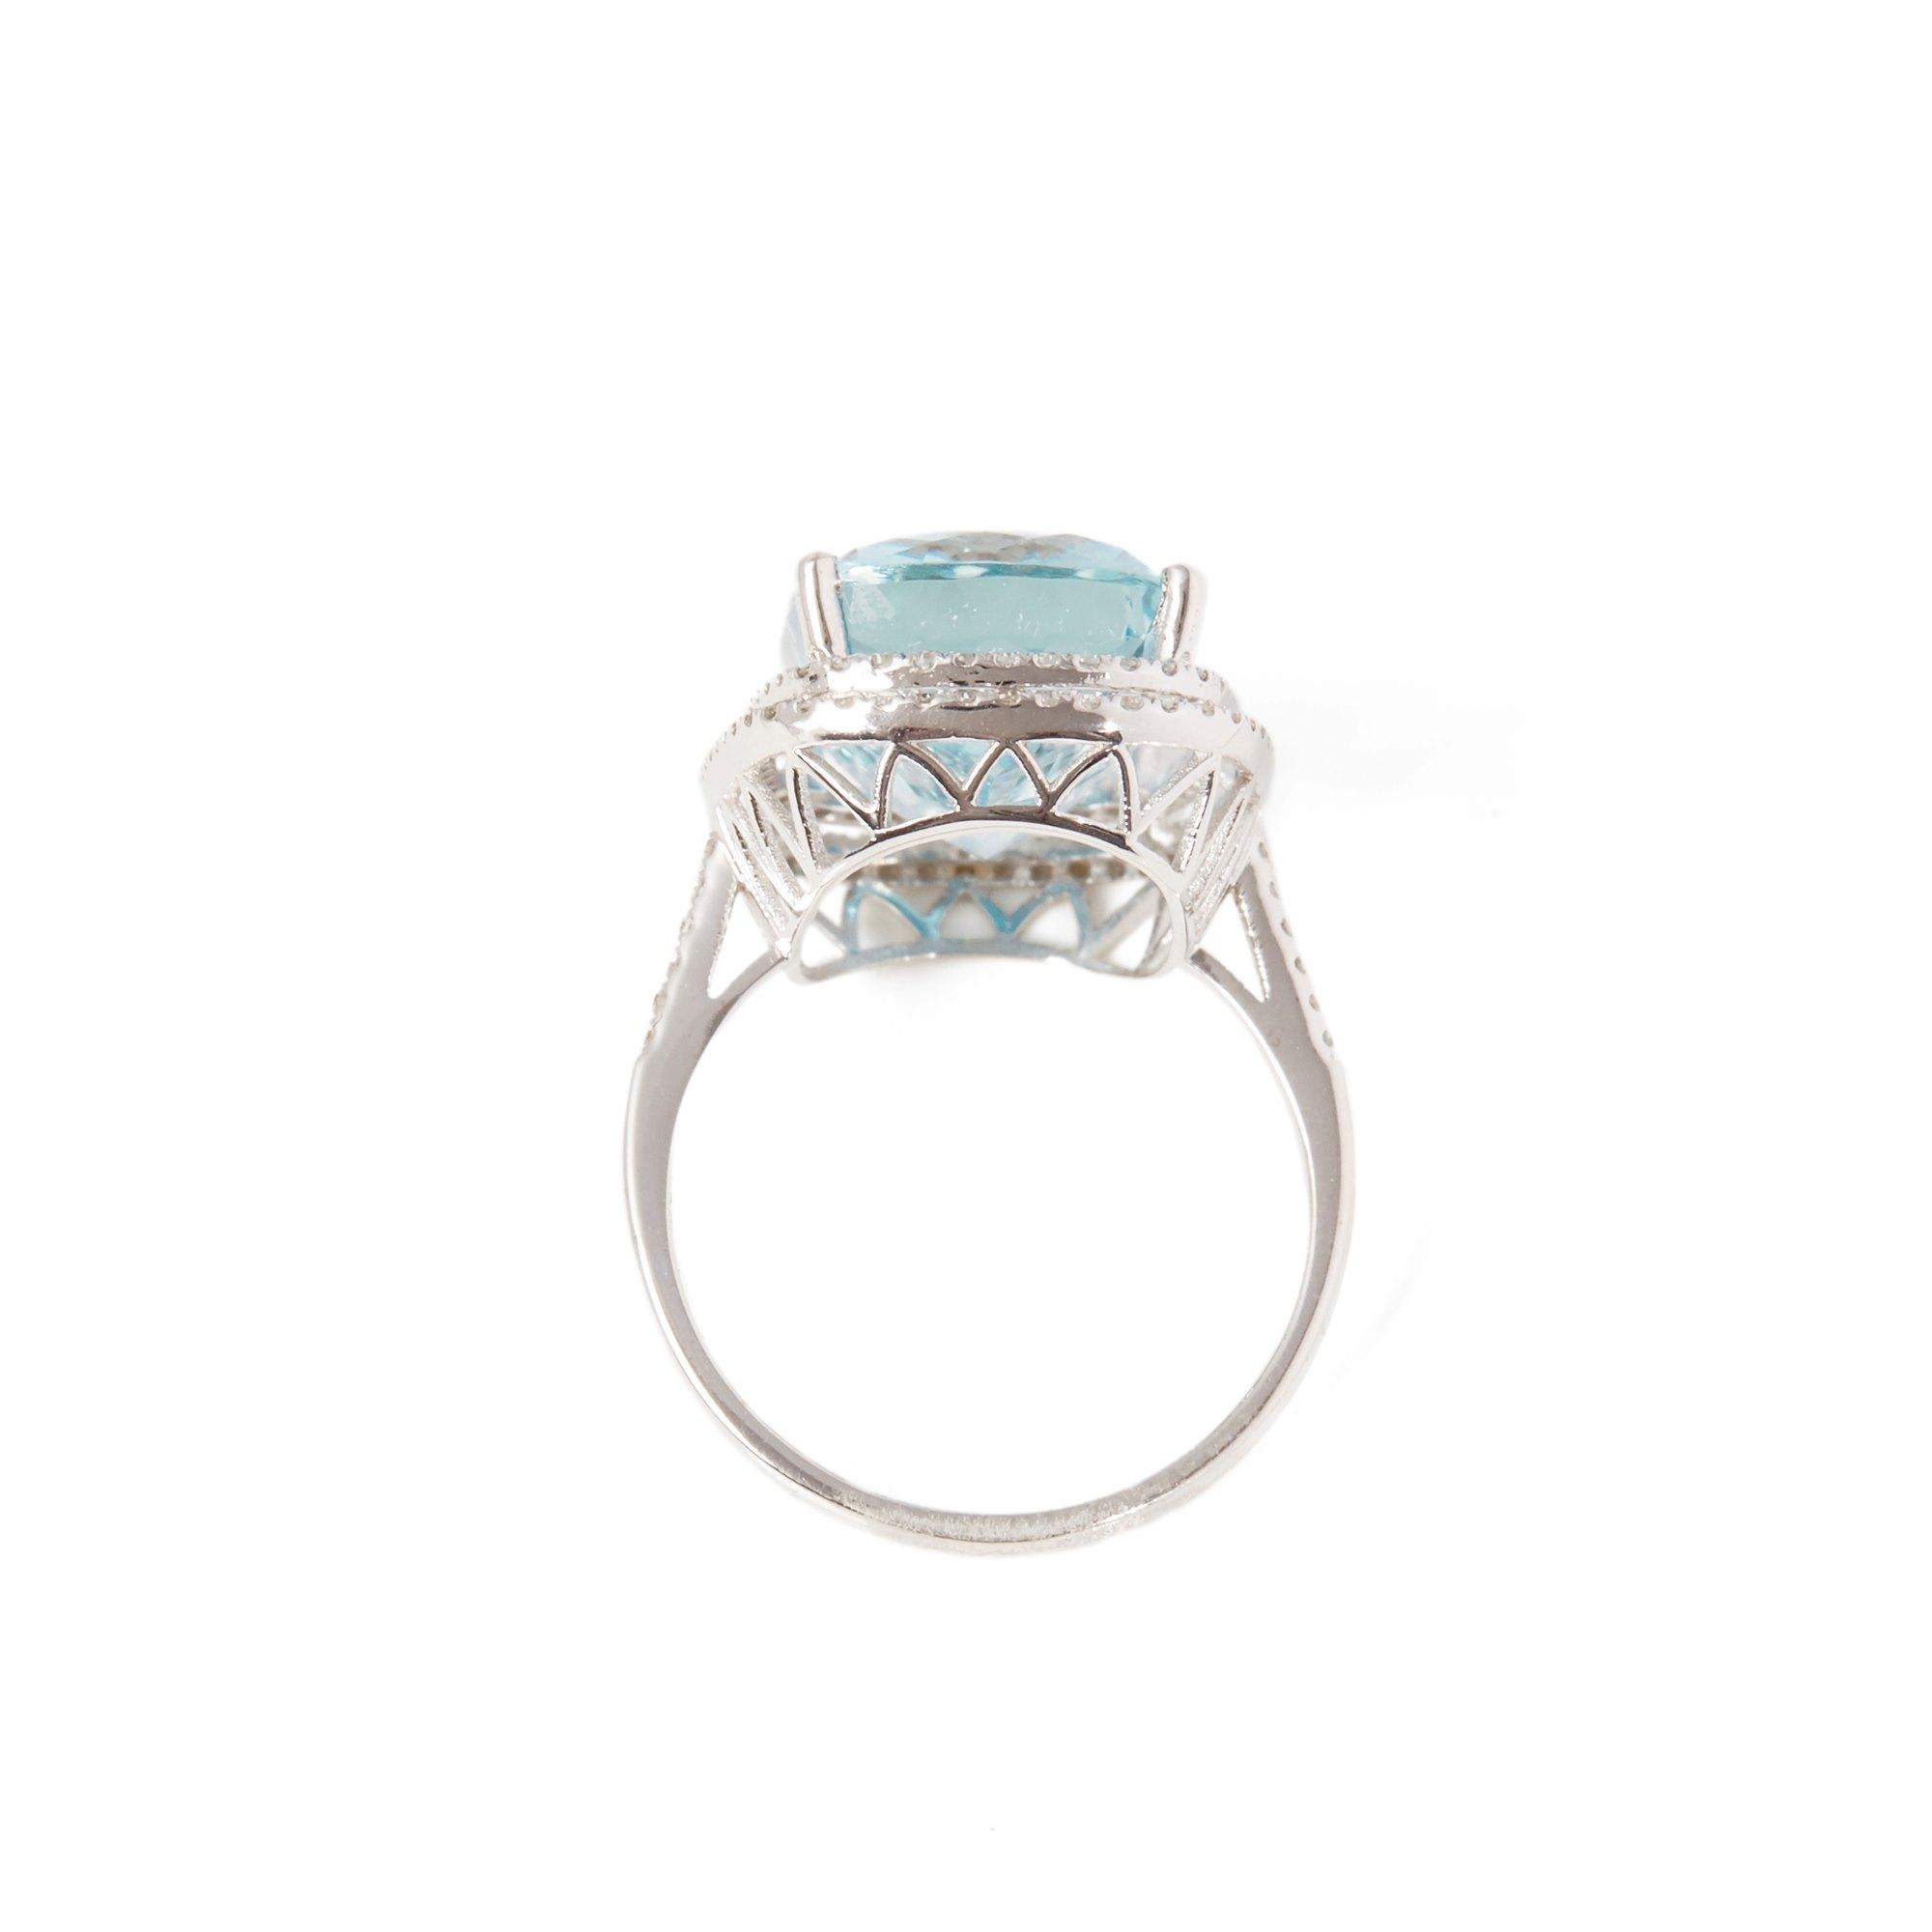 David Jerome Certified 10.96ct Brazilian Aquamarine and Diamond 18ct gold Ring